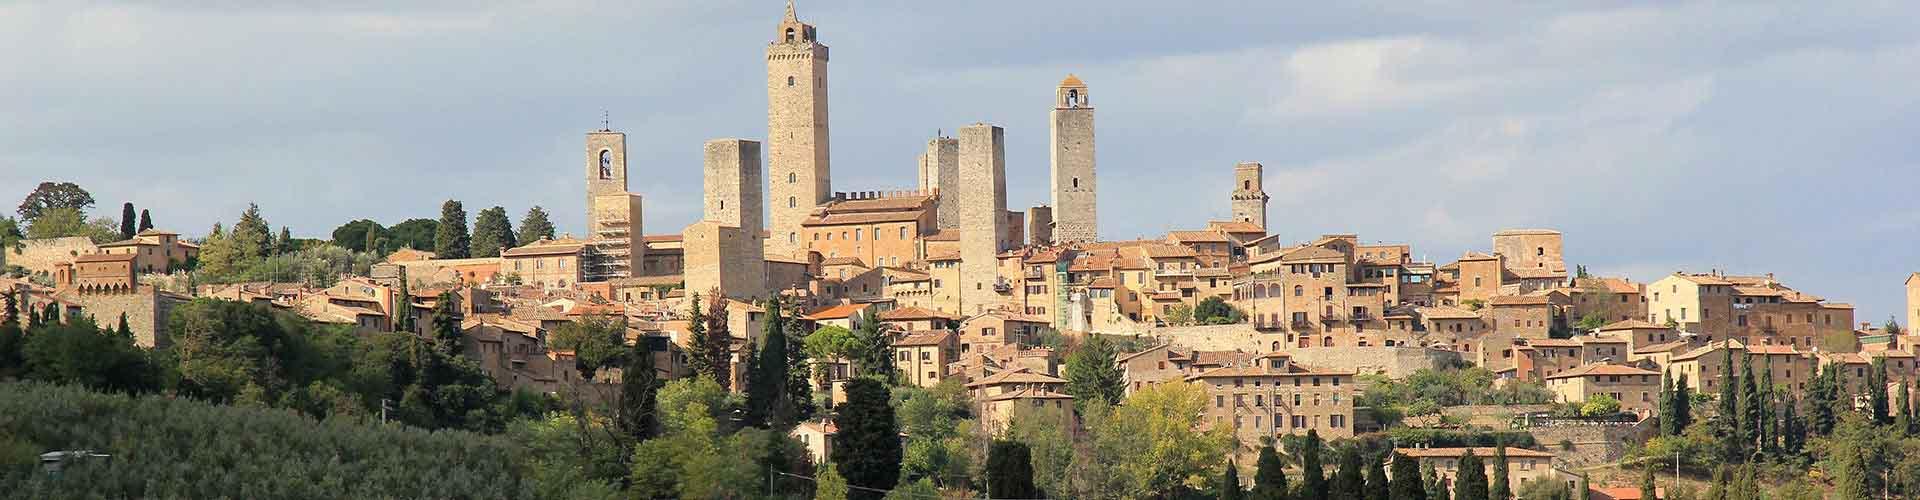 San Gimignano - Campamentos en San Gimignano. Mapas de San Gimignano, Fotos y comentarios de cada Campamento en San Gimignano.